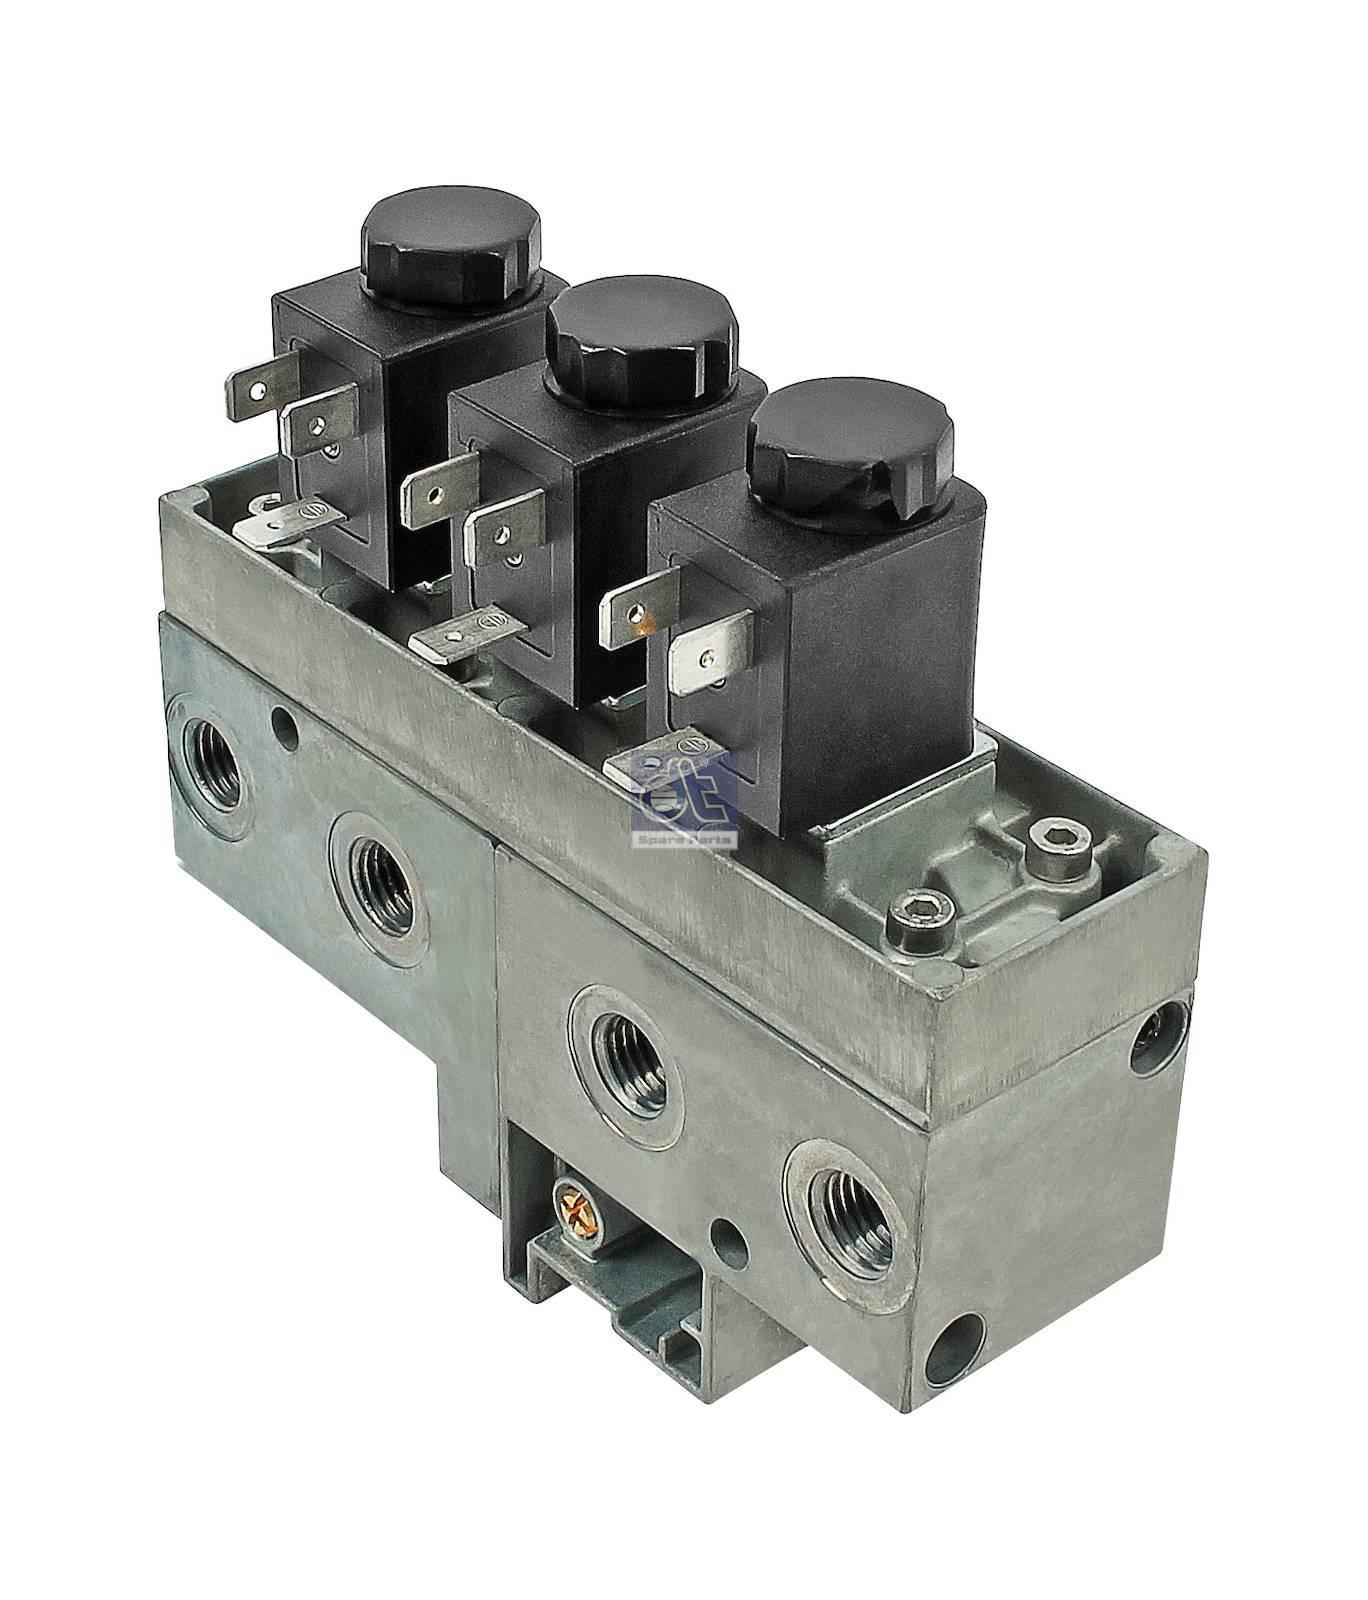 Solenoid valve, MTS